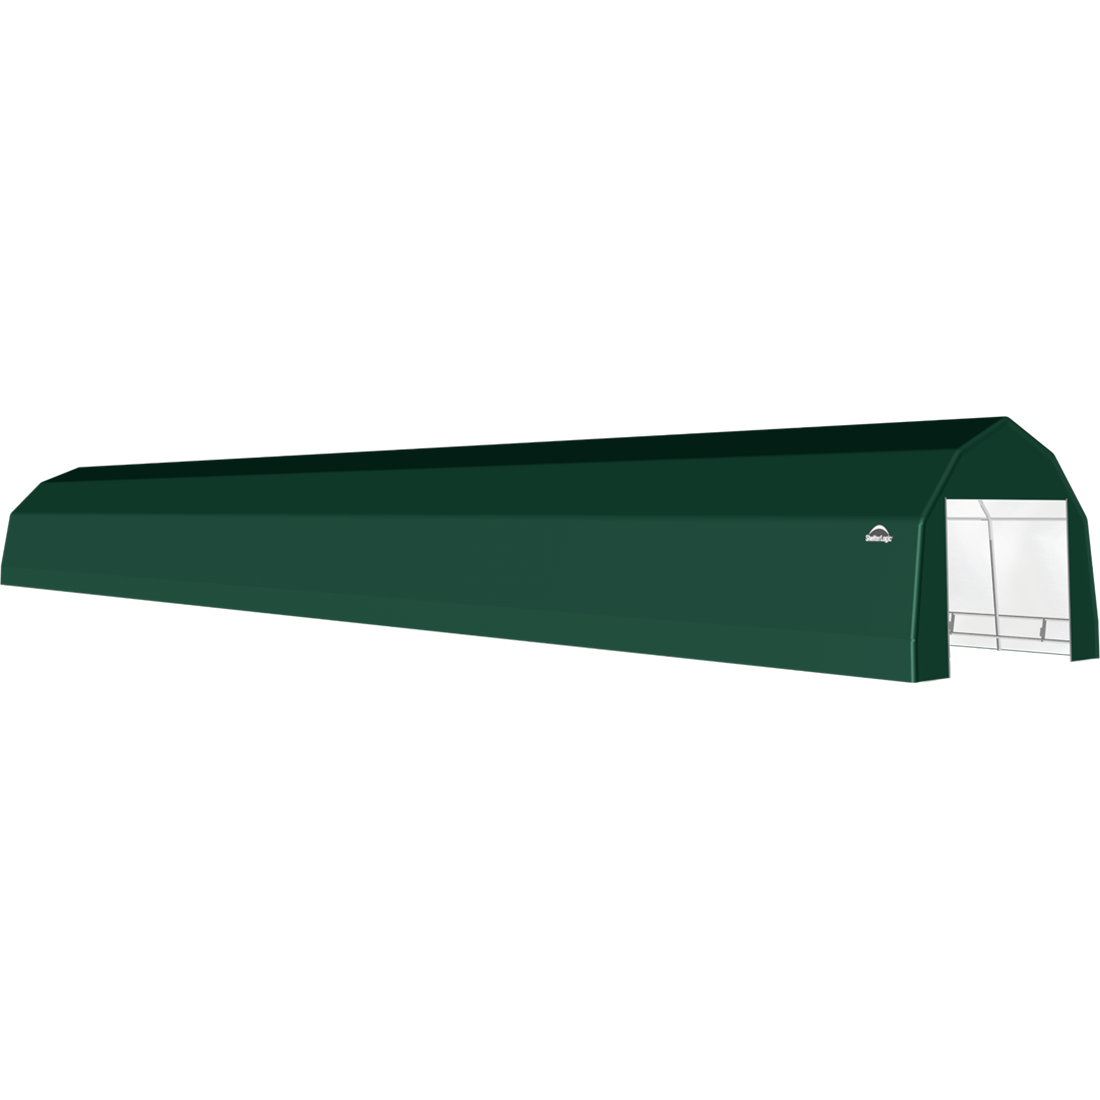 SP Barn 12X72X9 Green 14 oz PE Shelter